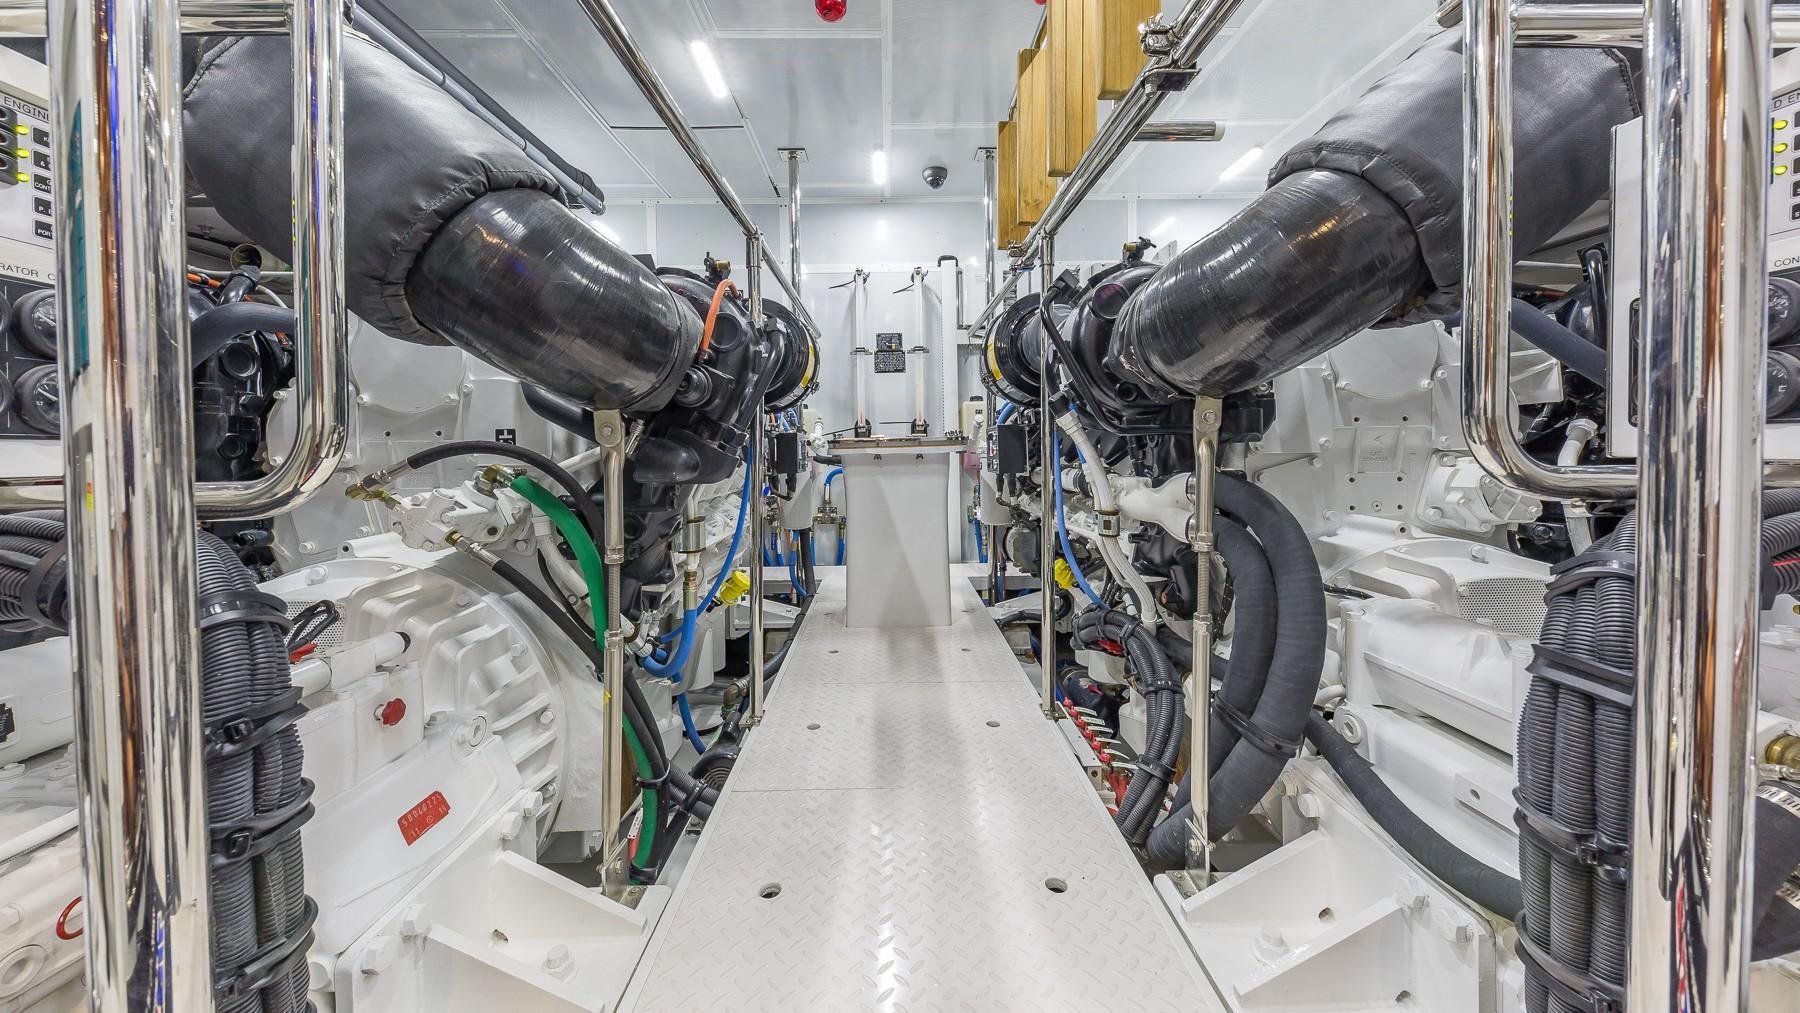 2018 Hargrave Raised Pilothouse 33976 Fuel Filter